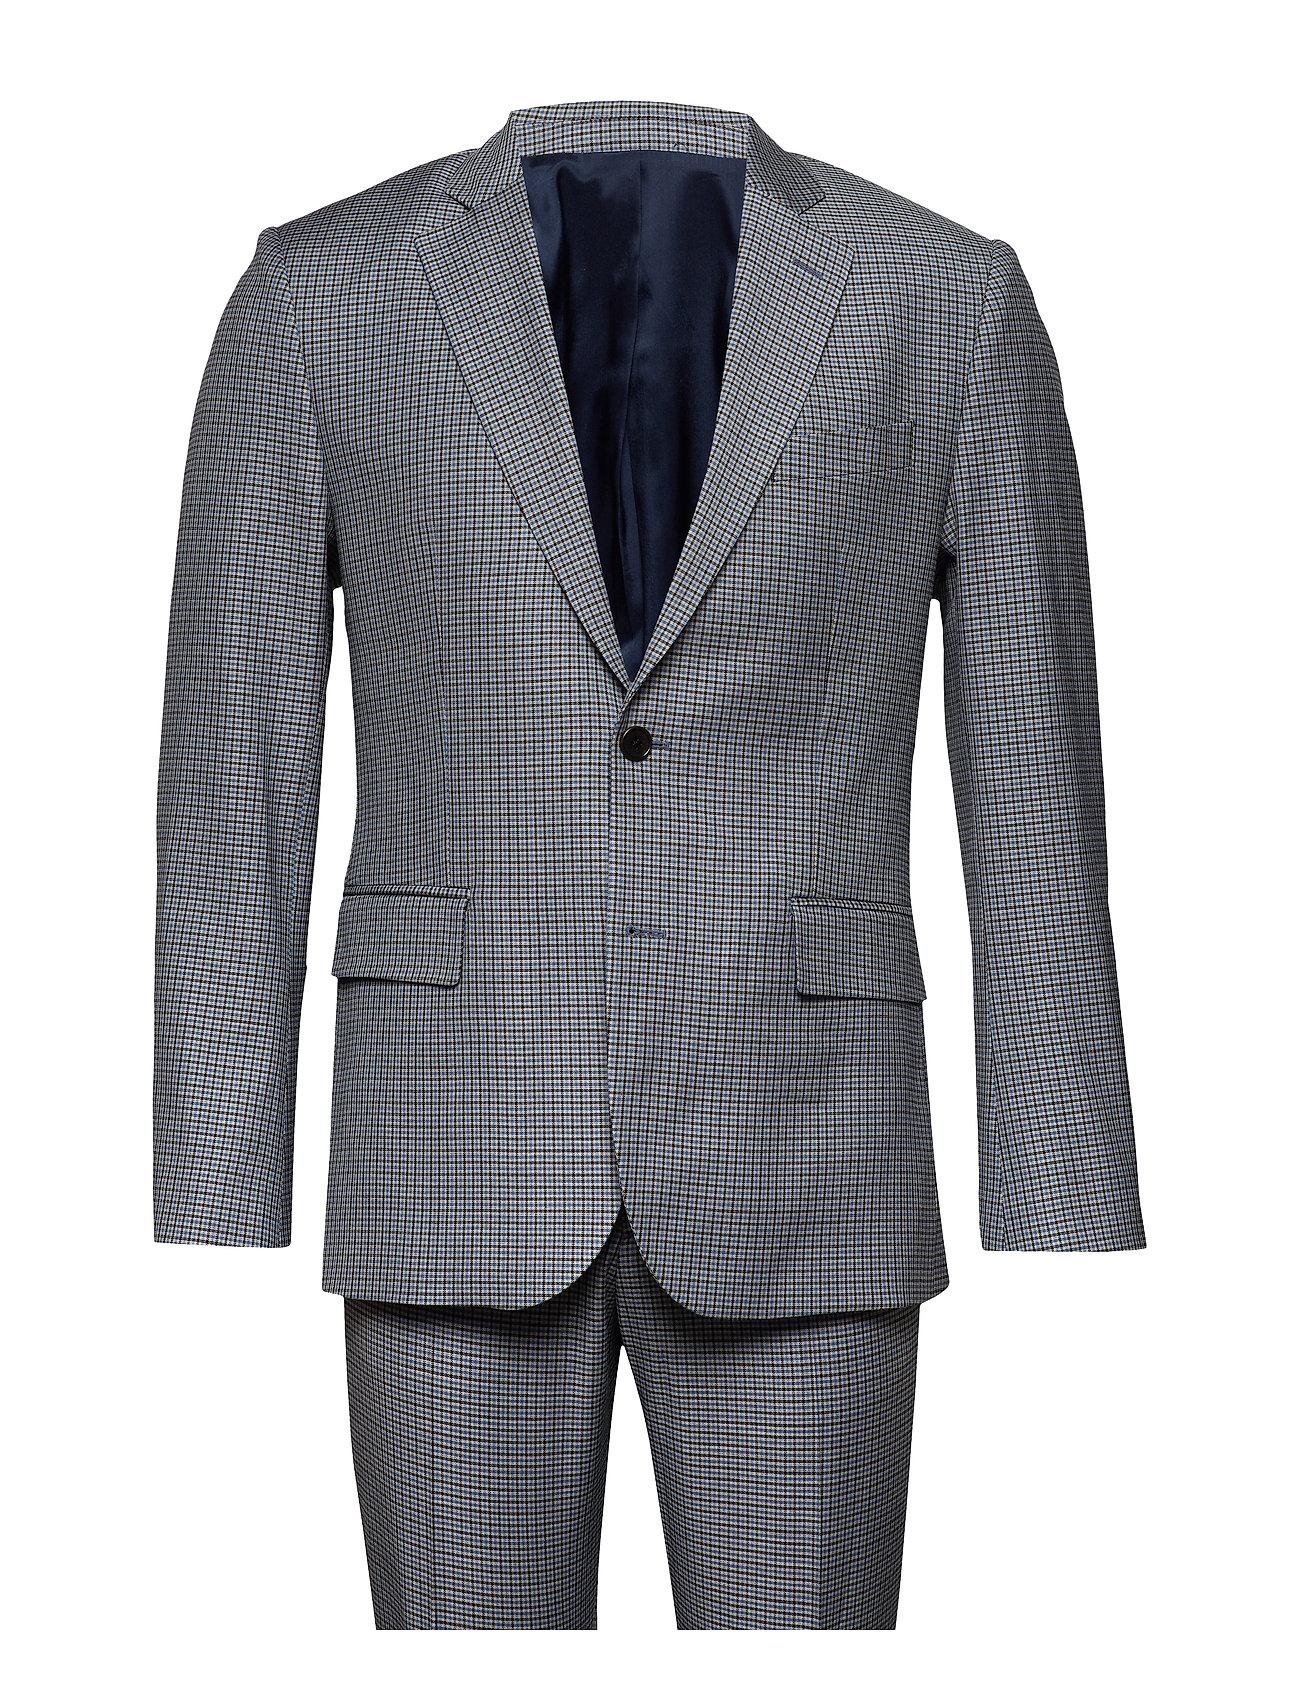 J. Lindeberg Hopper Soft S Micro Check Kostymer & kavajer